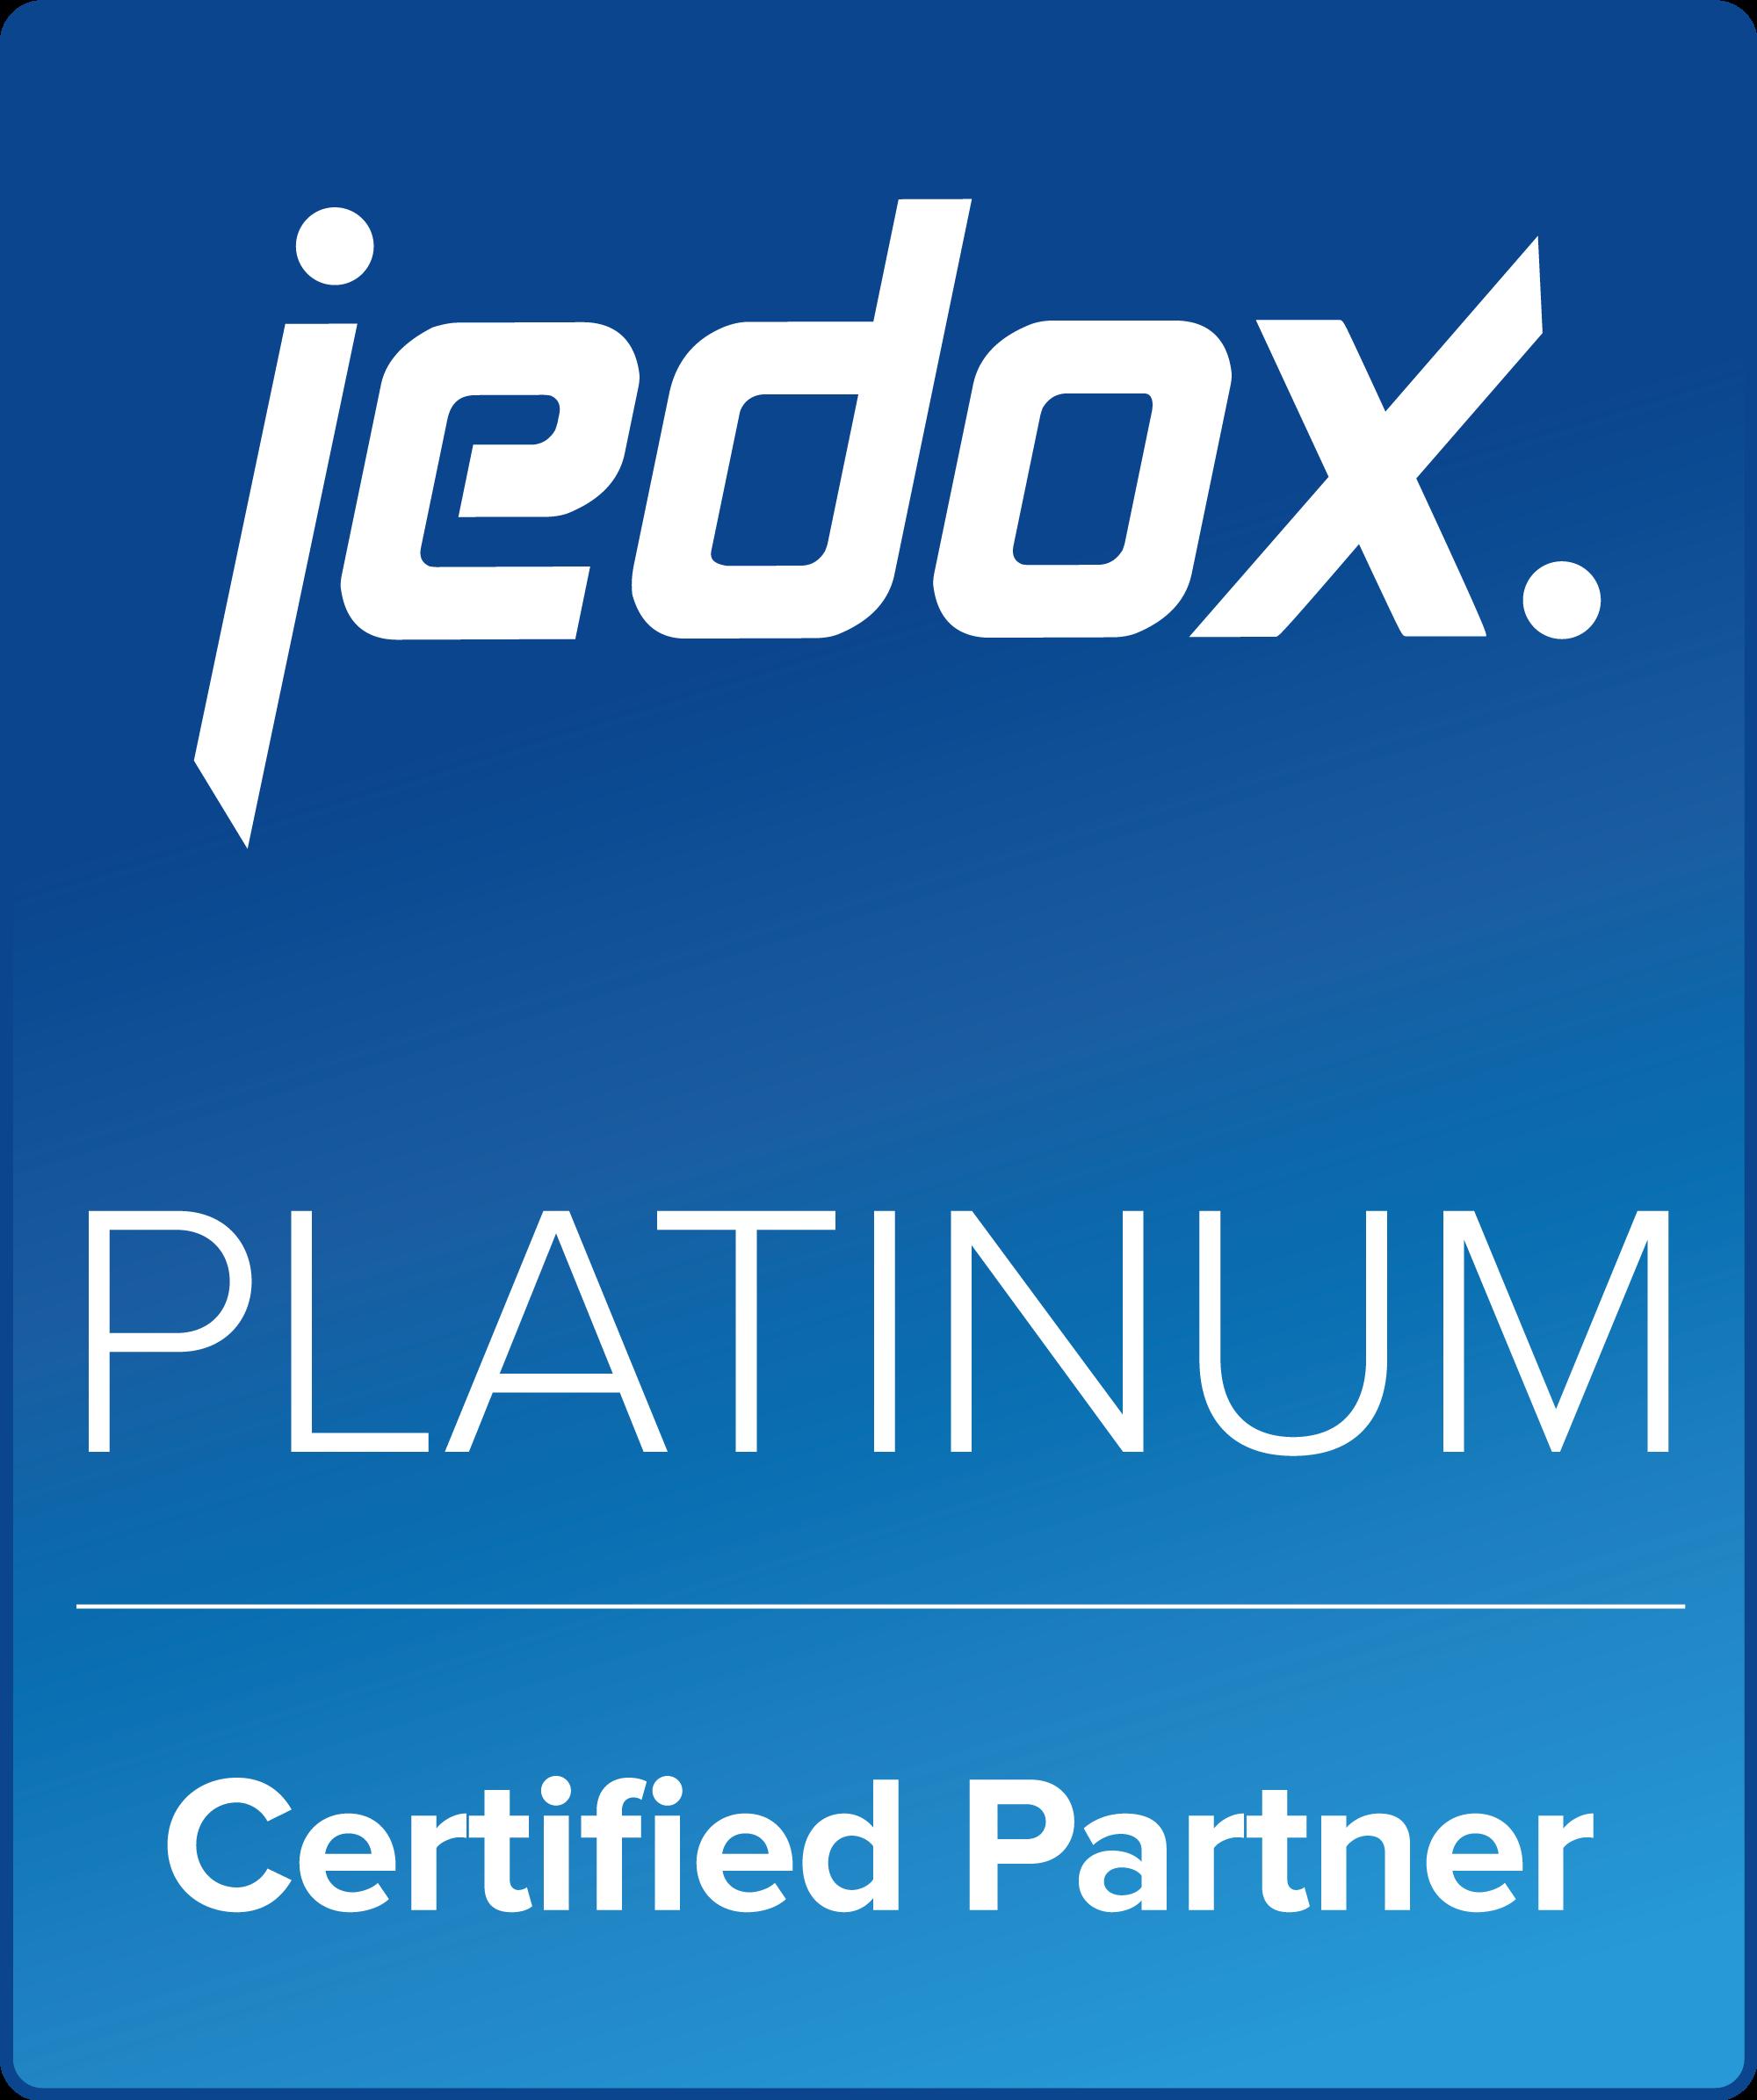 jedox-certified-partner-Platinum-logo